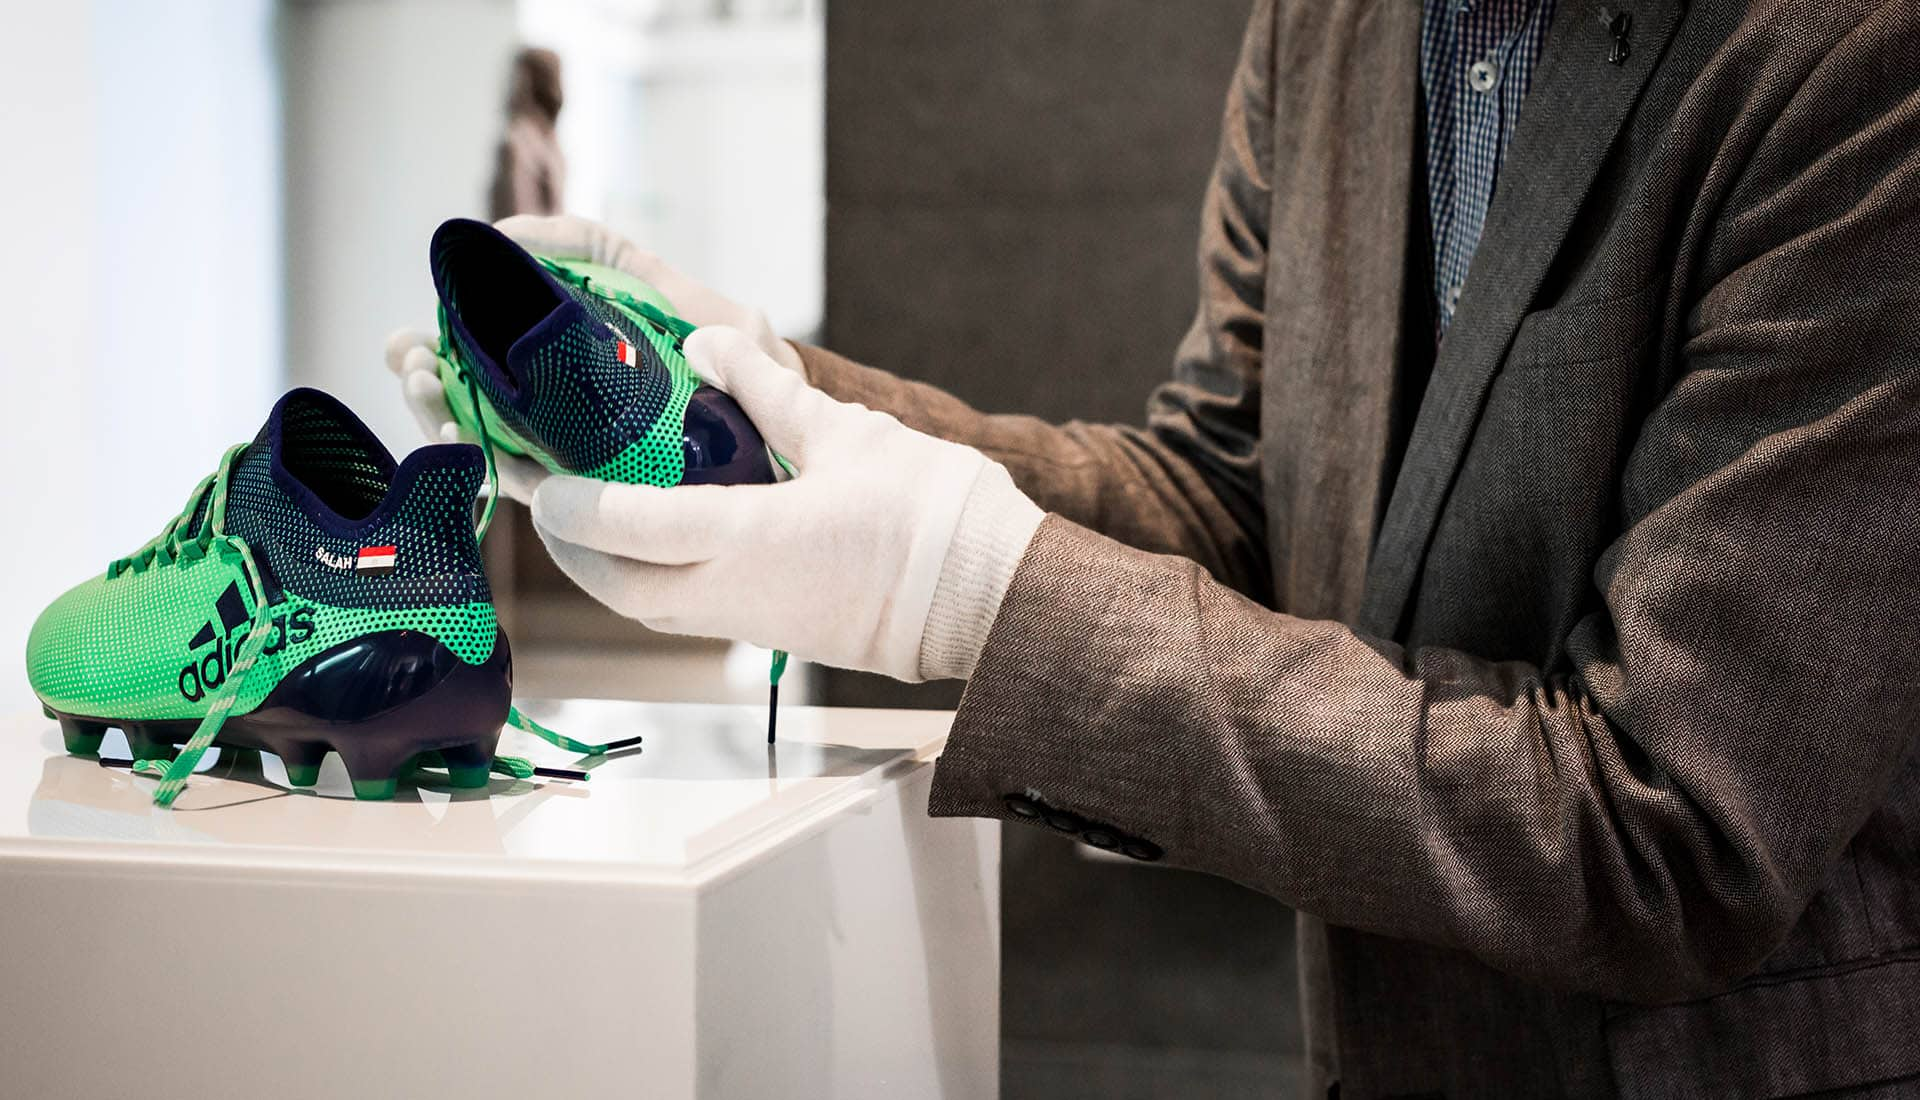 chaussures-football-adidas-X17-Mohamed-Salah-British-Museum-img5